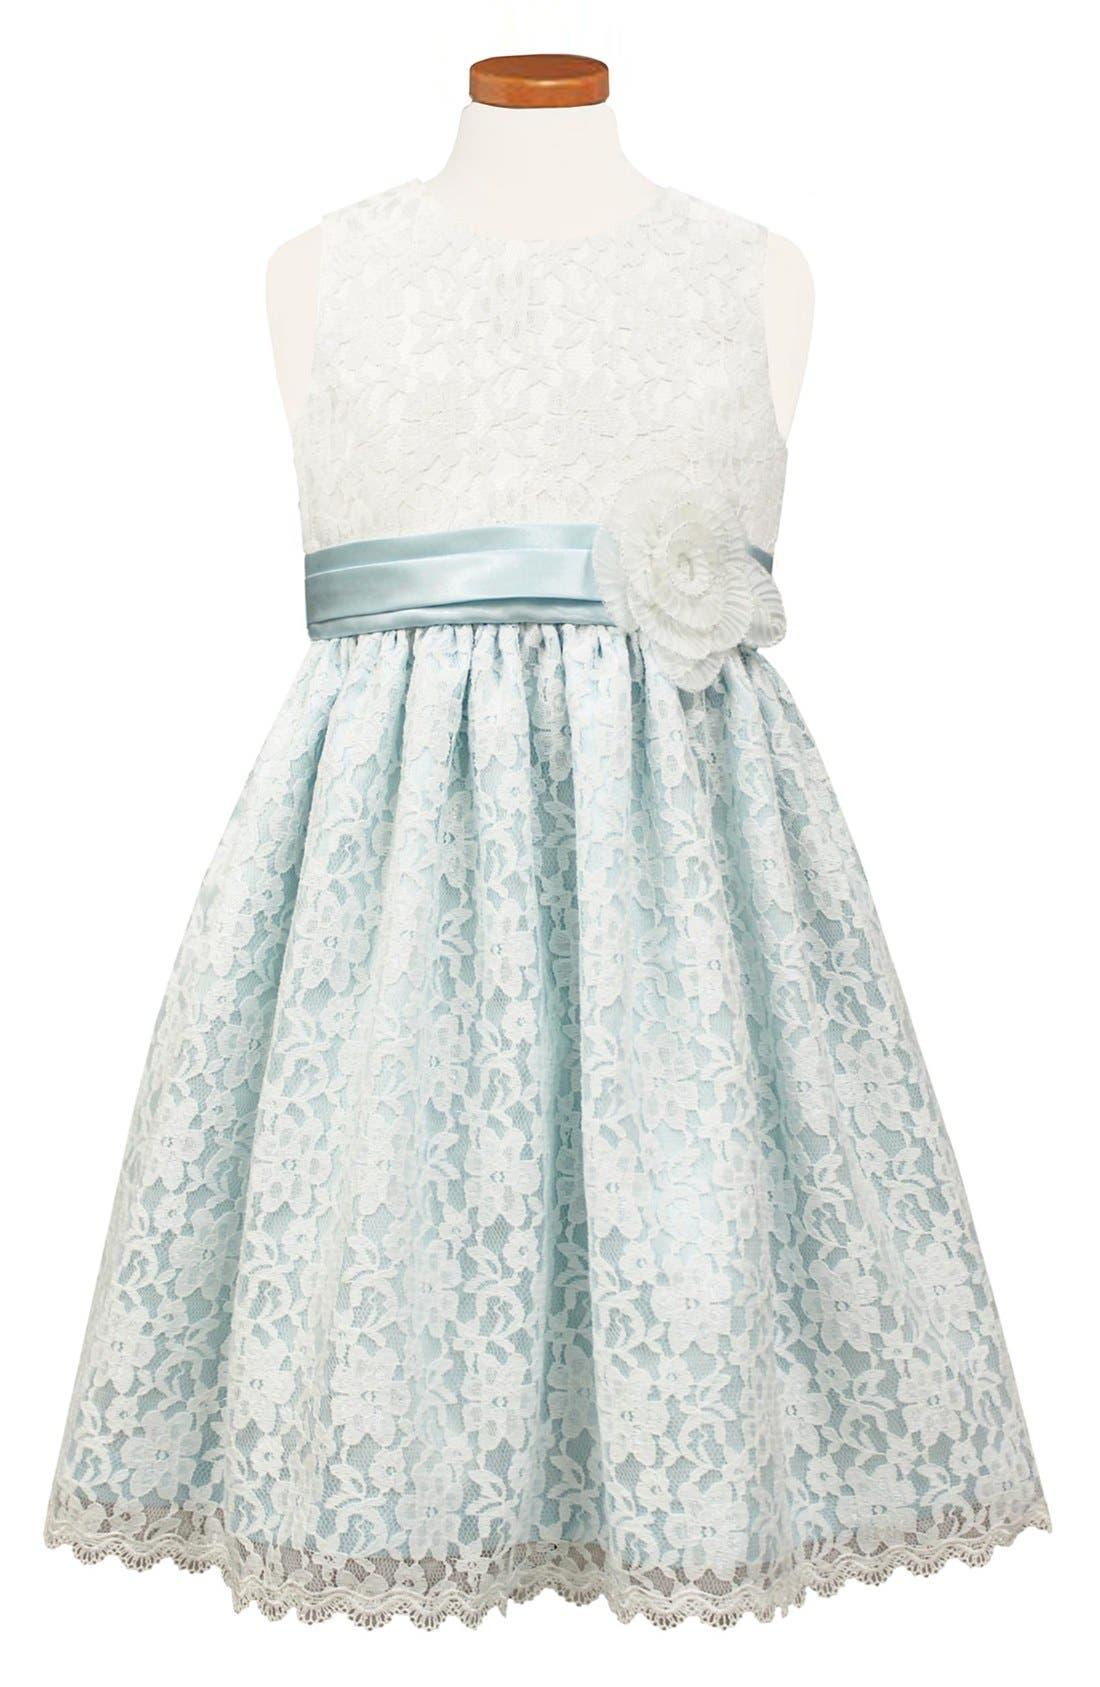 SORBET Floral Lace Dress